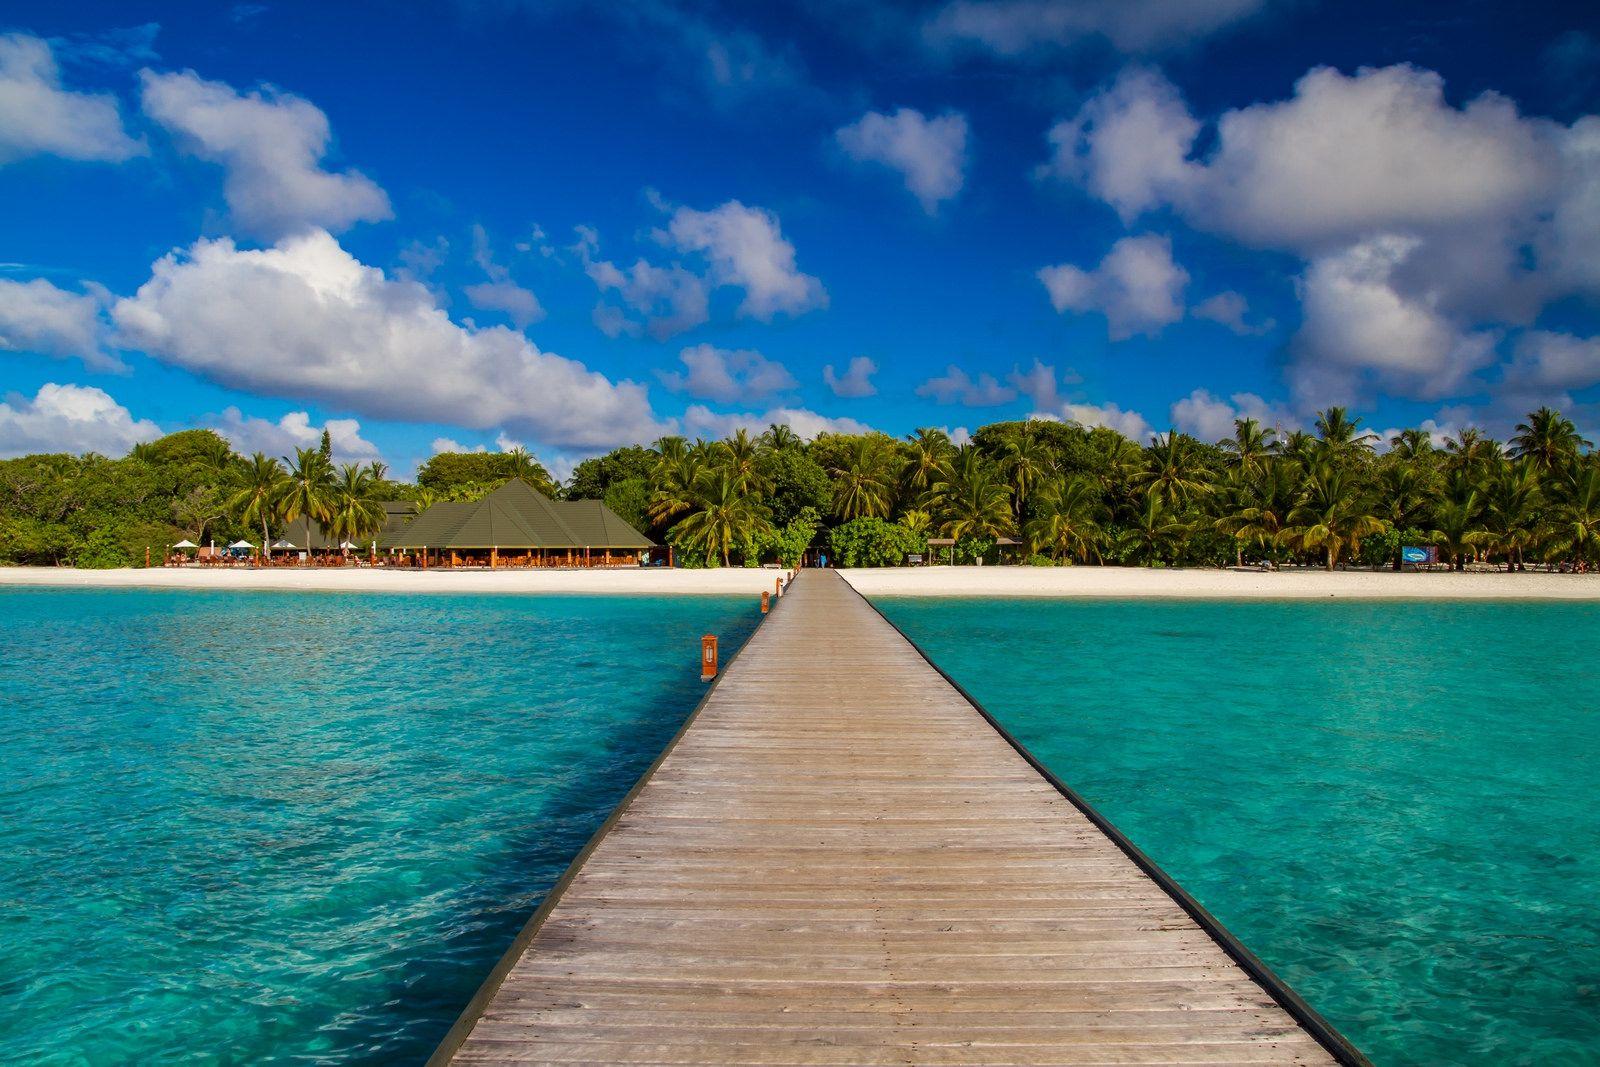 Pier of the Paradise Island Resort & Spa, North Male Atoll, Maldives ✯ ωнιмѕу ѕαη∂у